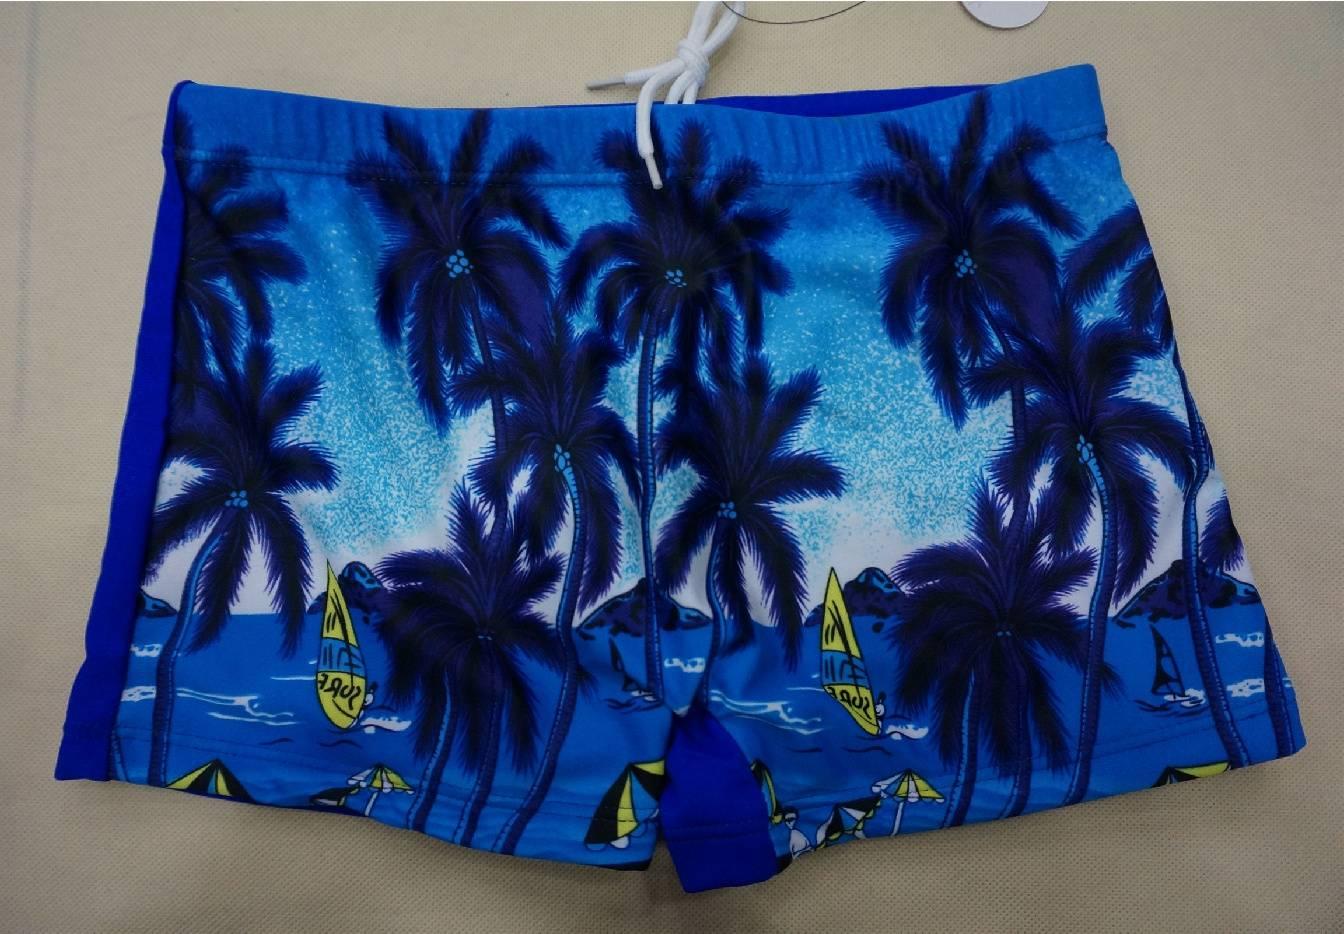 Digital Print patterned children swim trunk